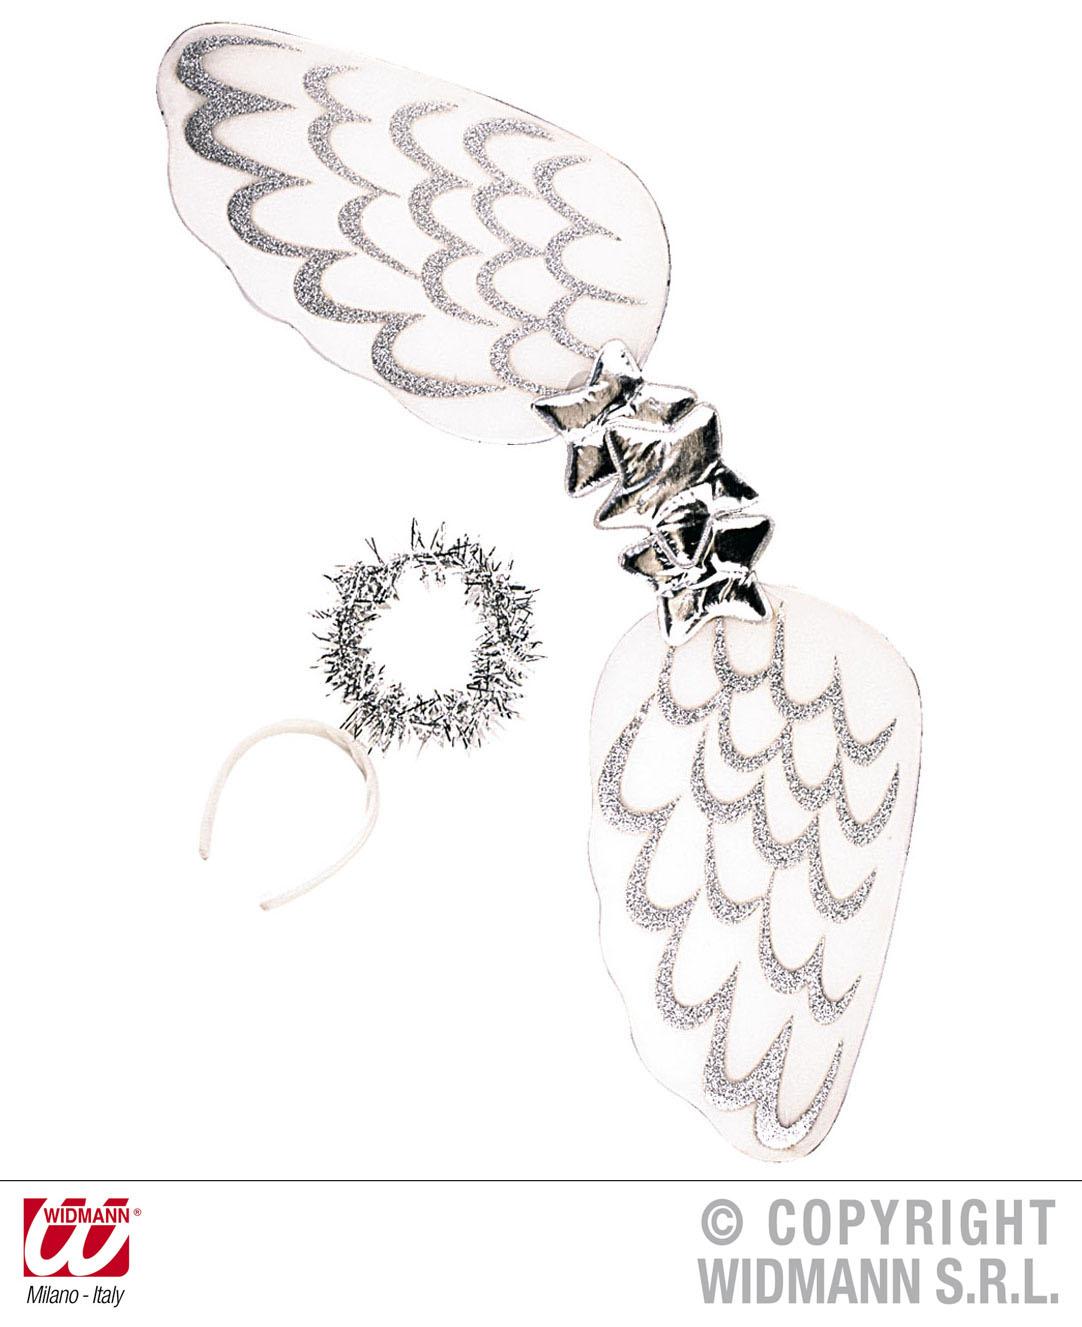 Angel Dress-up Set - White/Silver Christmas Fancy Dress Accessory